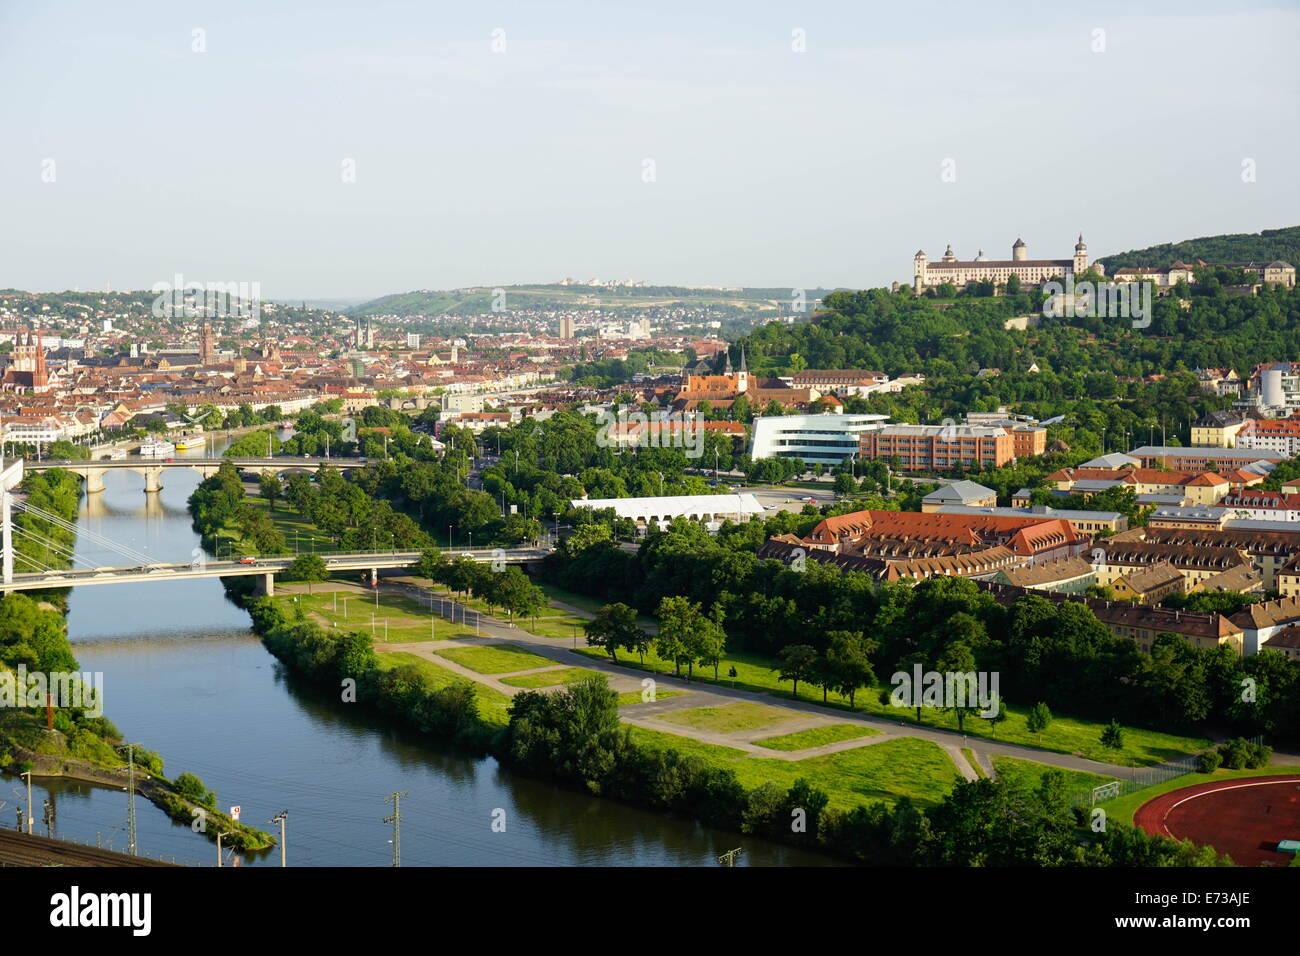 Rivière Main, Würzburg, Bavaria, Germany, Europe Photo Stock